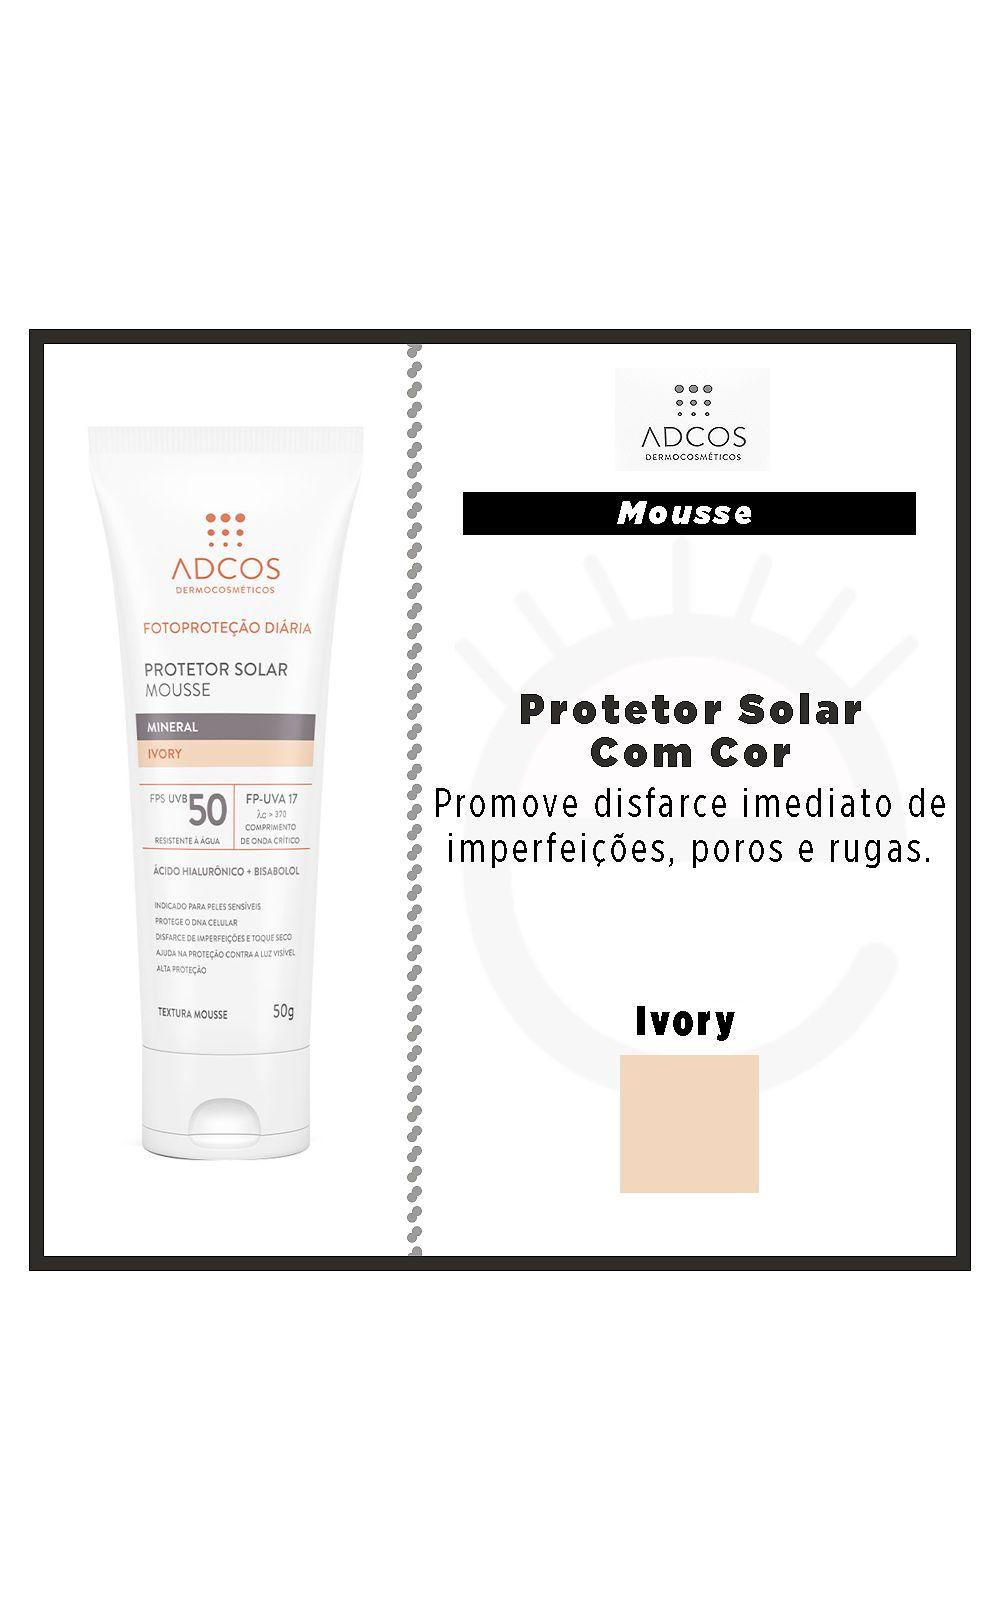 Foto 4 - Protetor Solar ADCOS - Fotoproteção Mousse Mineral Ivory - Ivory